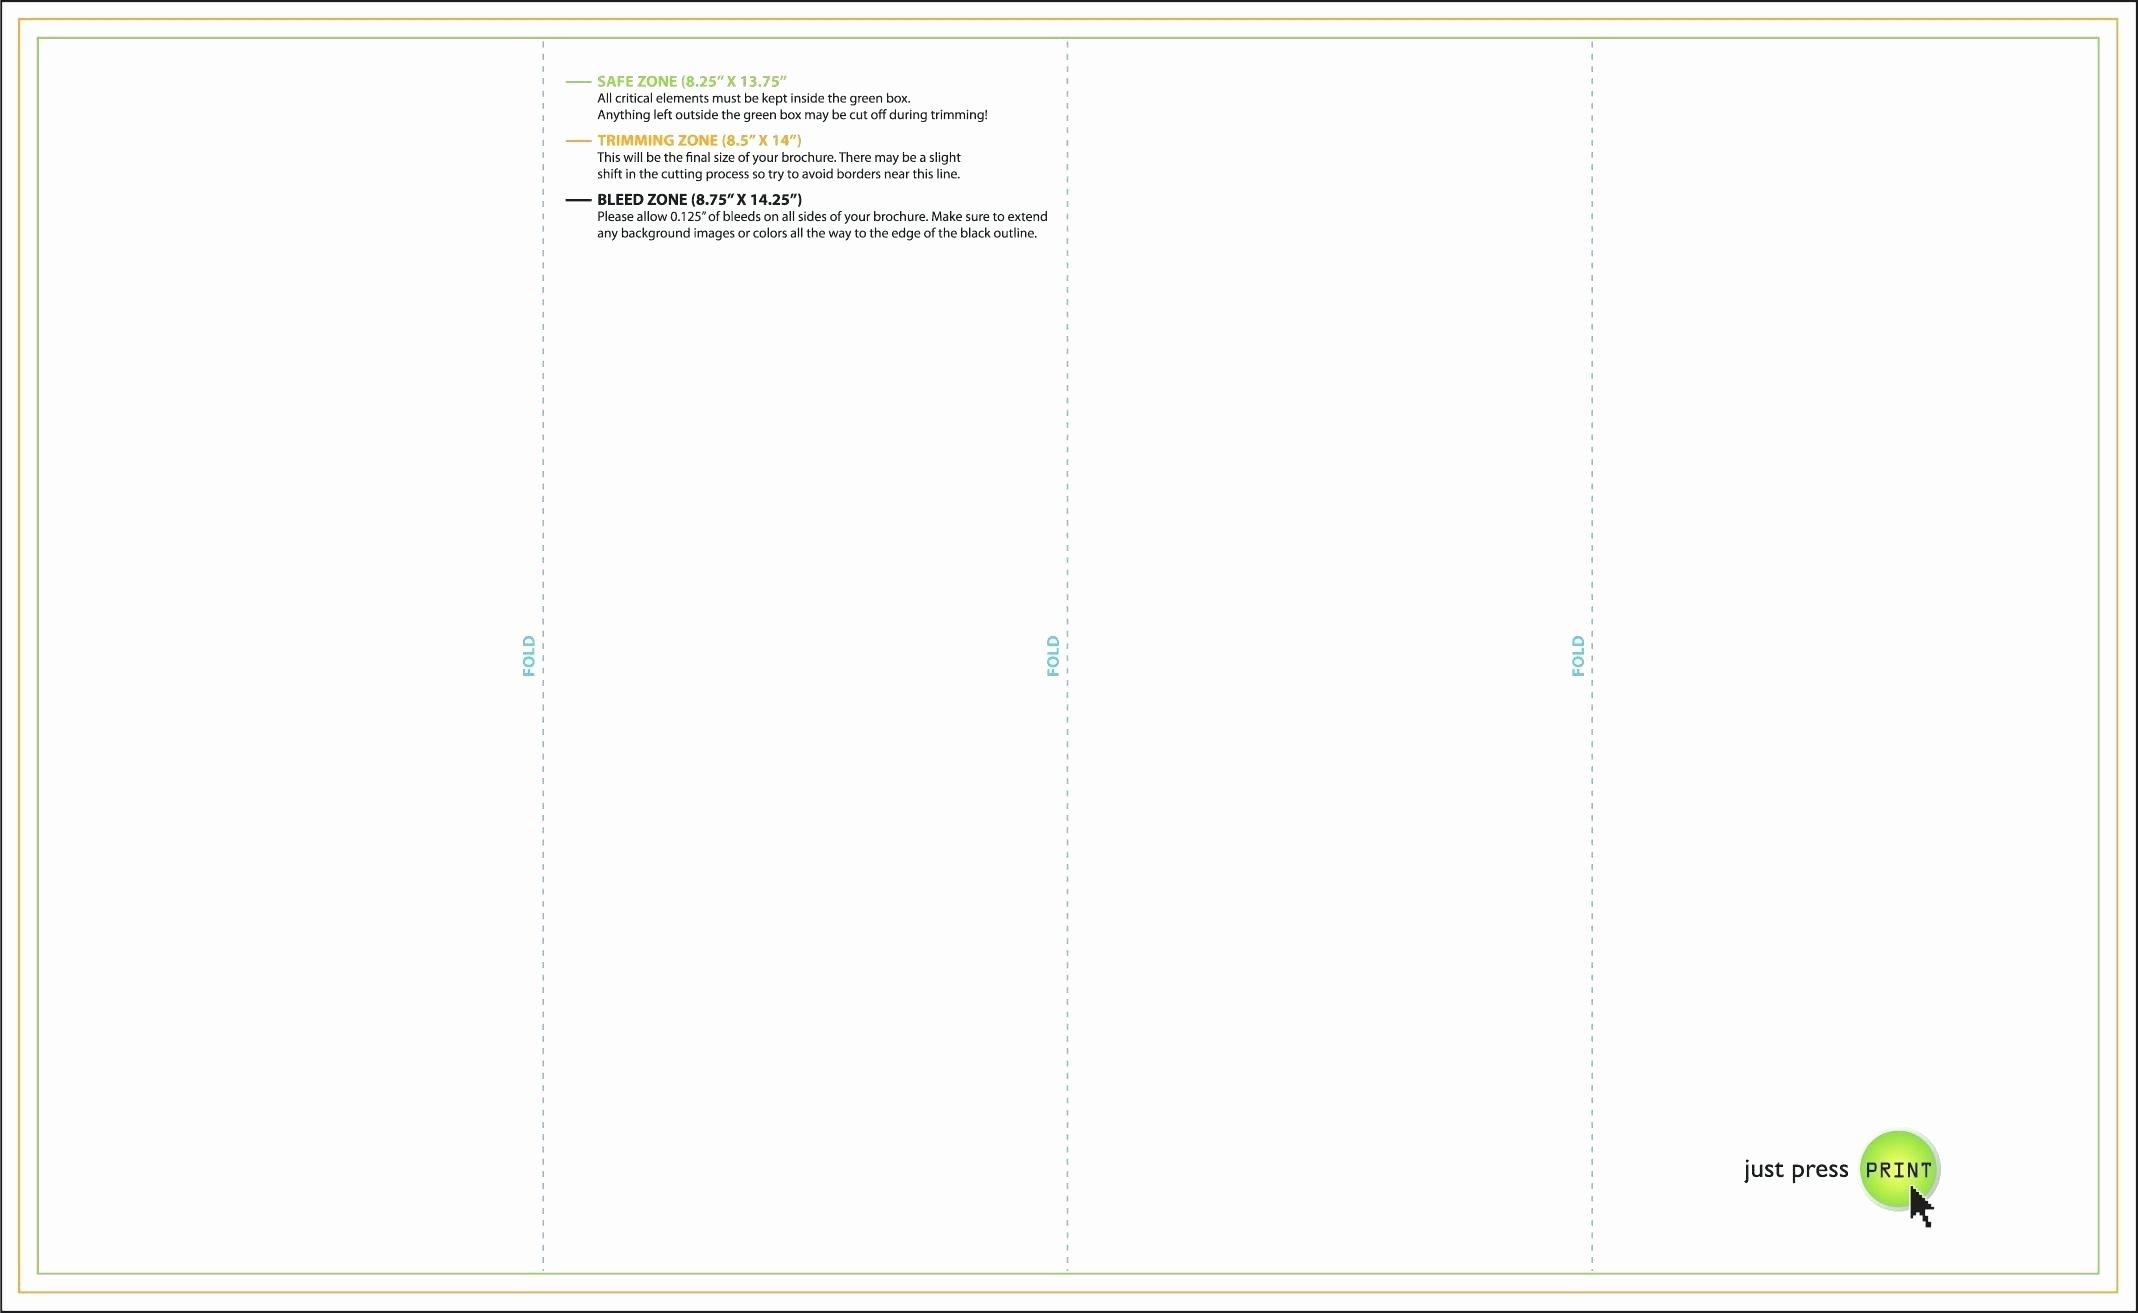 Google Doc Newsletter Template Beautiful Special S Newsletter Template Google Docs